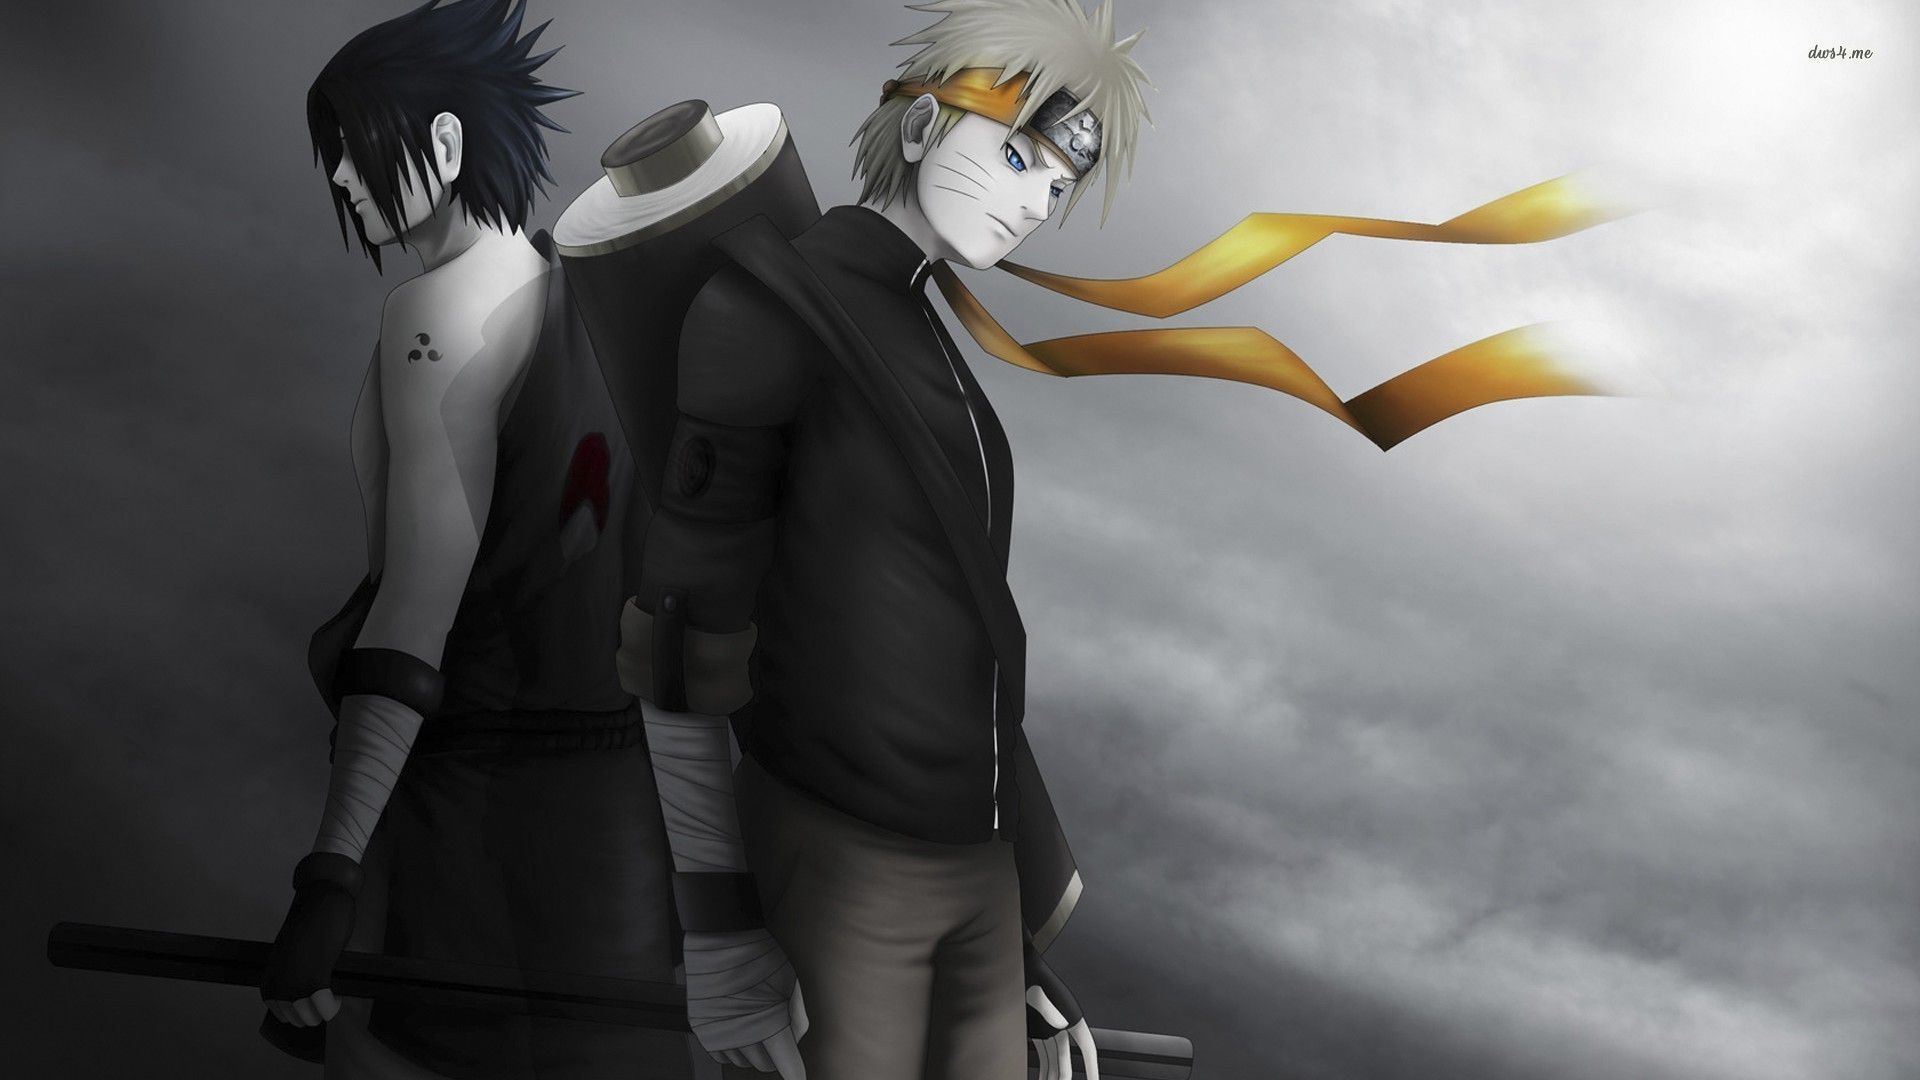 Anime 3d Wallpapers Hd Anime Wallpapers 1080p Group Sasuke Uchiha Wallpaper Hd 1200x675 Wallpaper Teahub Io